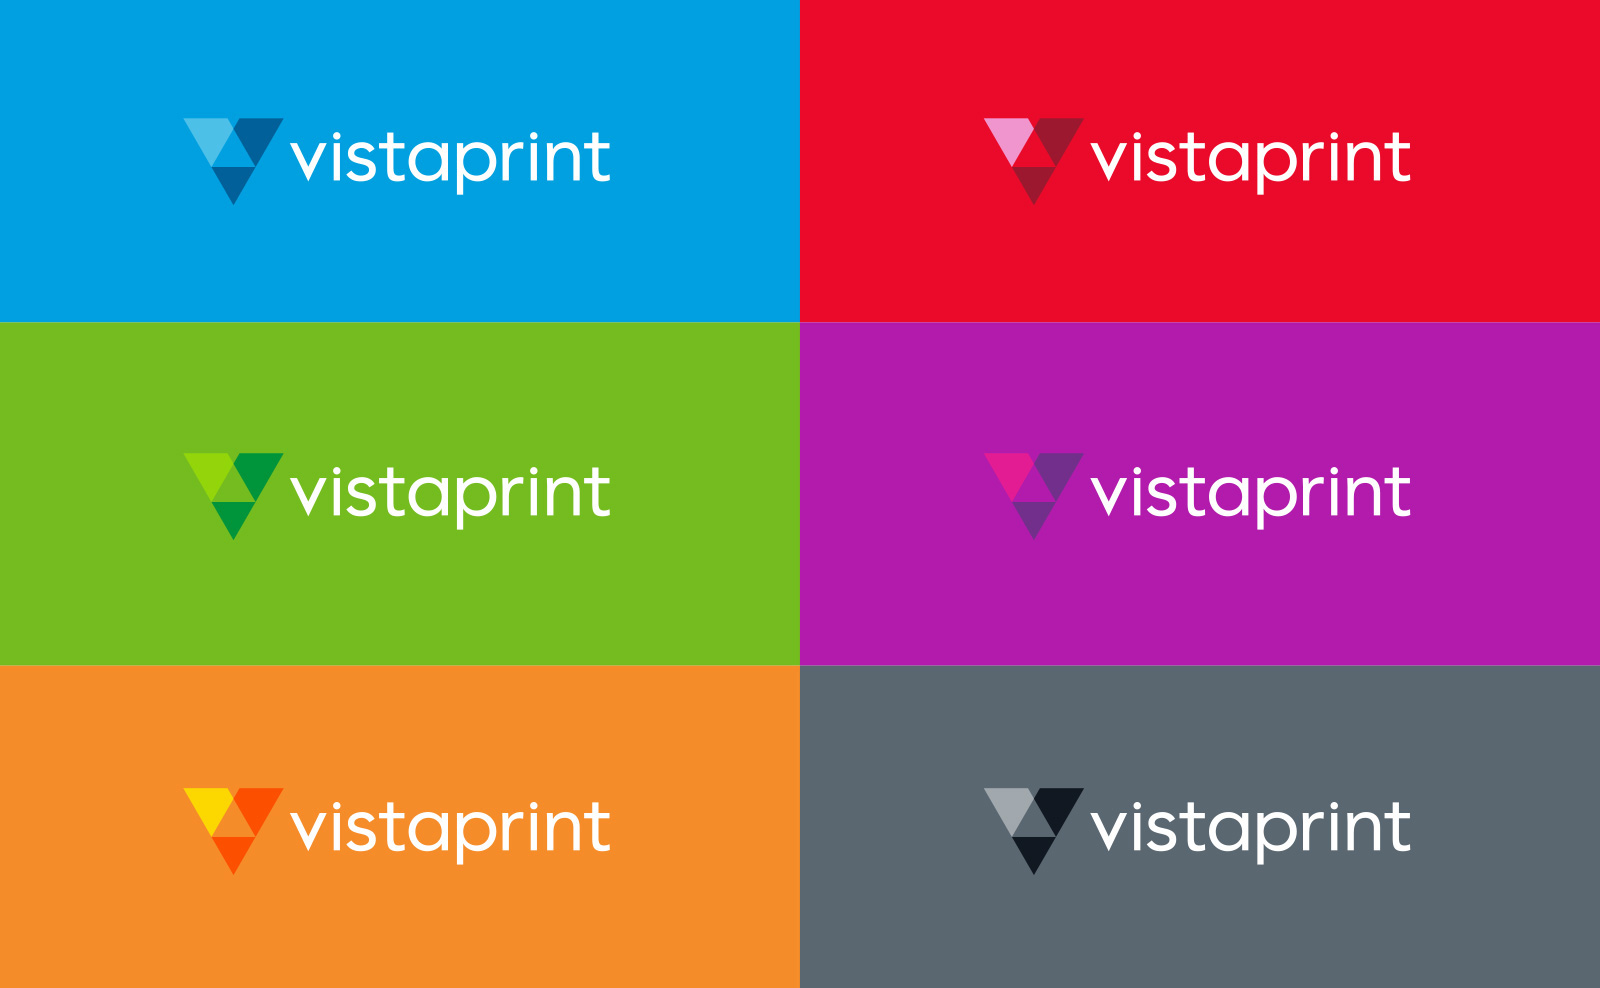 vistaprint-6